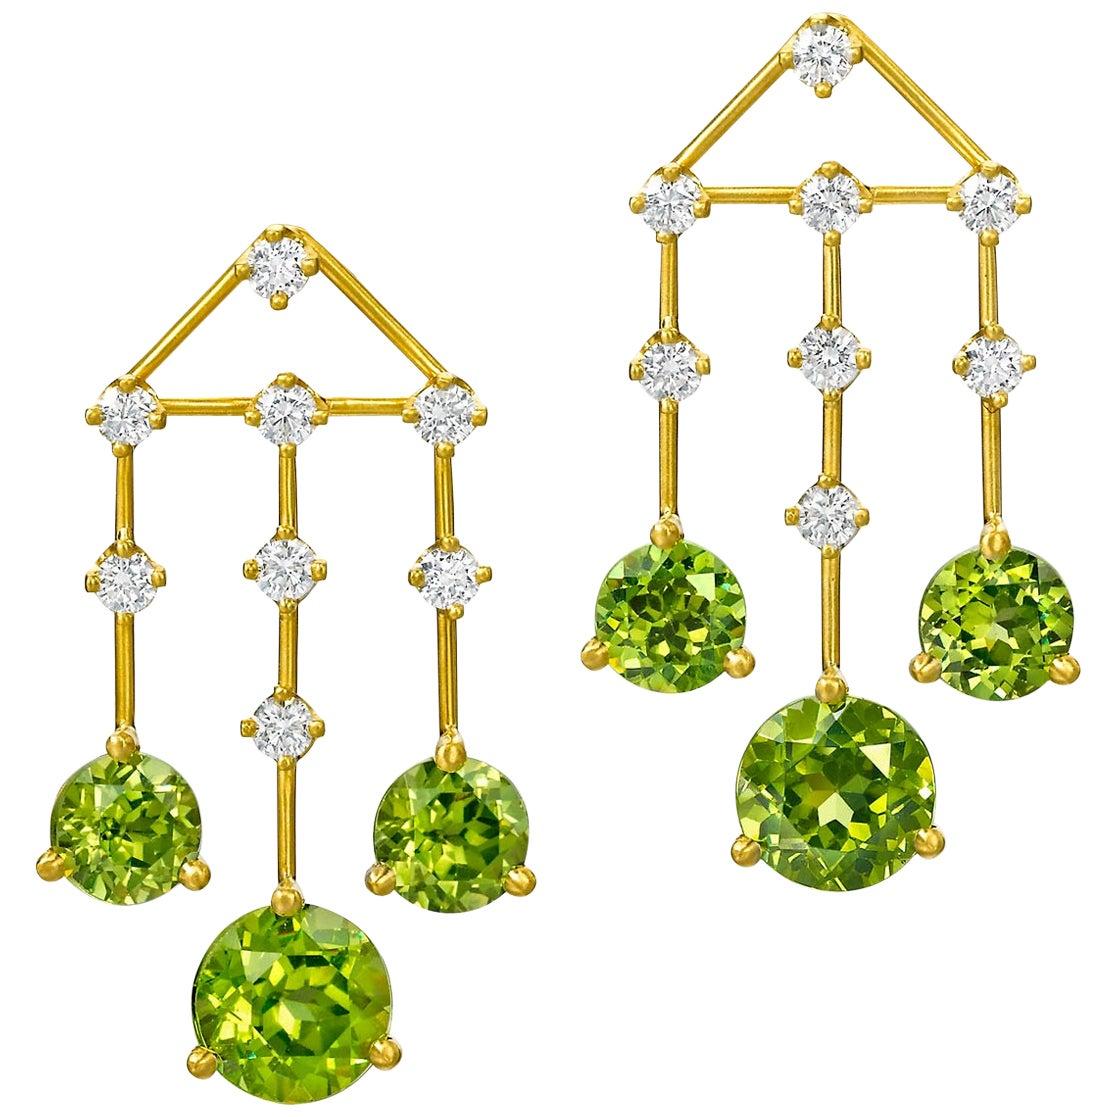 Wendy Brandes August Birthstone Peridot 1.41 Carat Diamond Chandelier Earrings